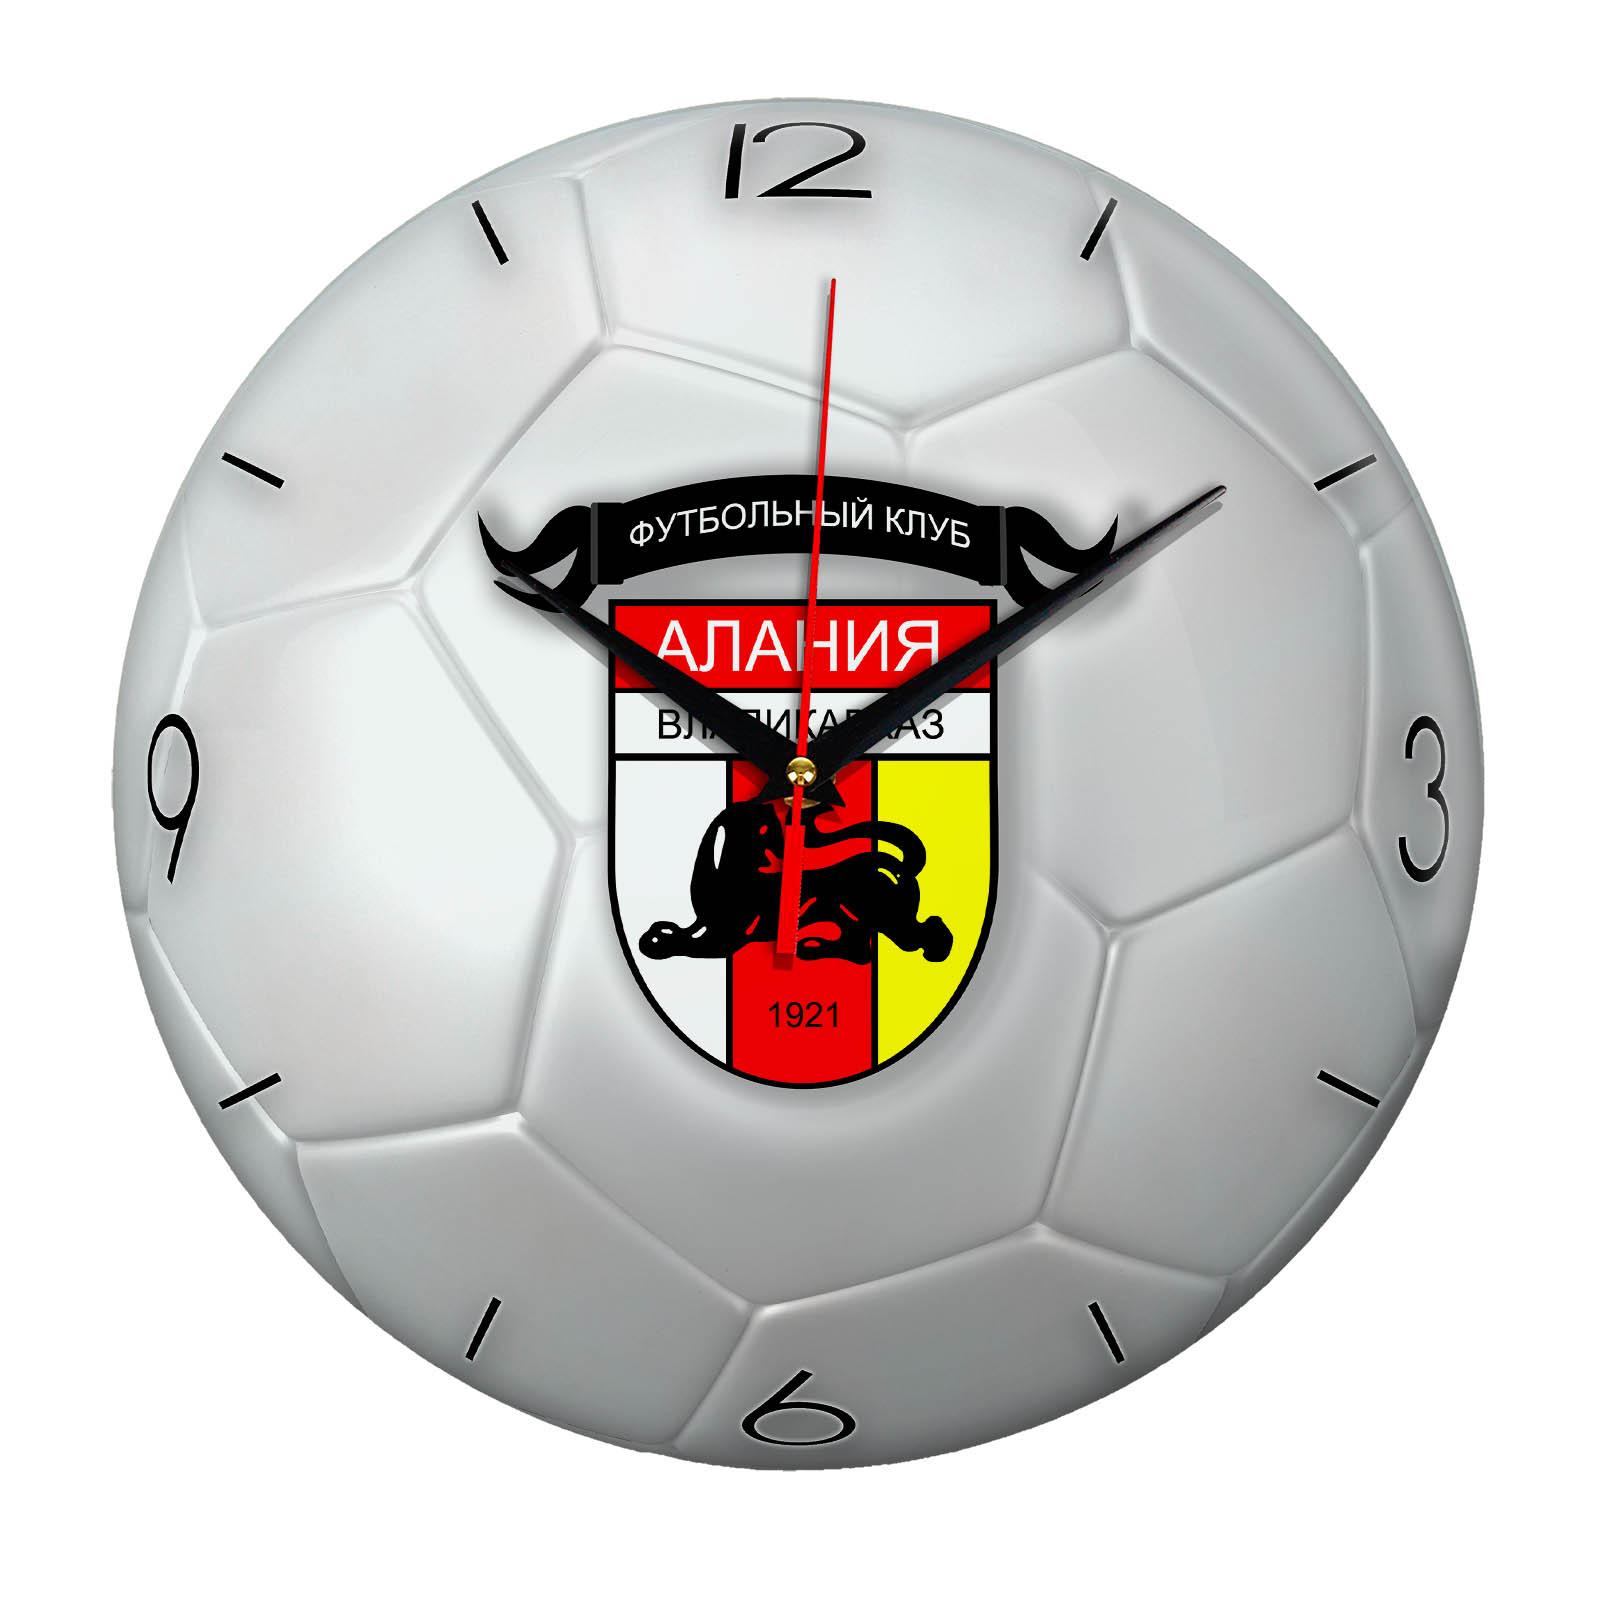 Настенные часы «Футбольный мяч ALANIYA VLADIKAVKAZ»